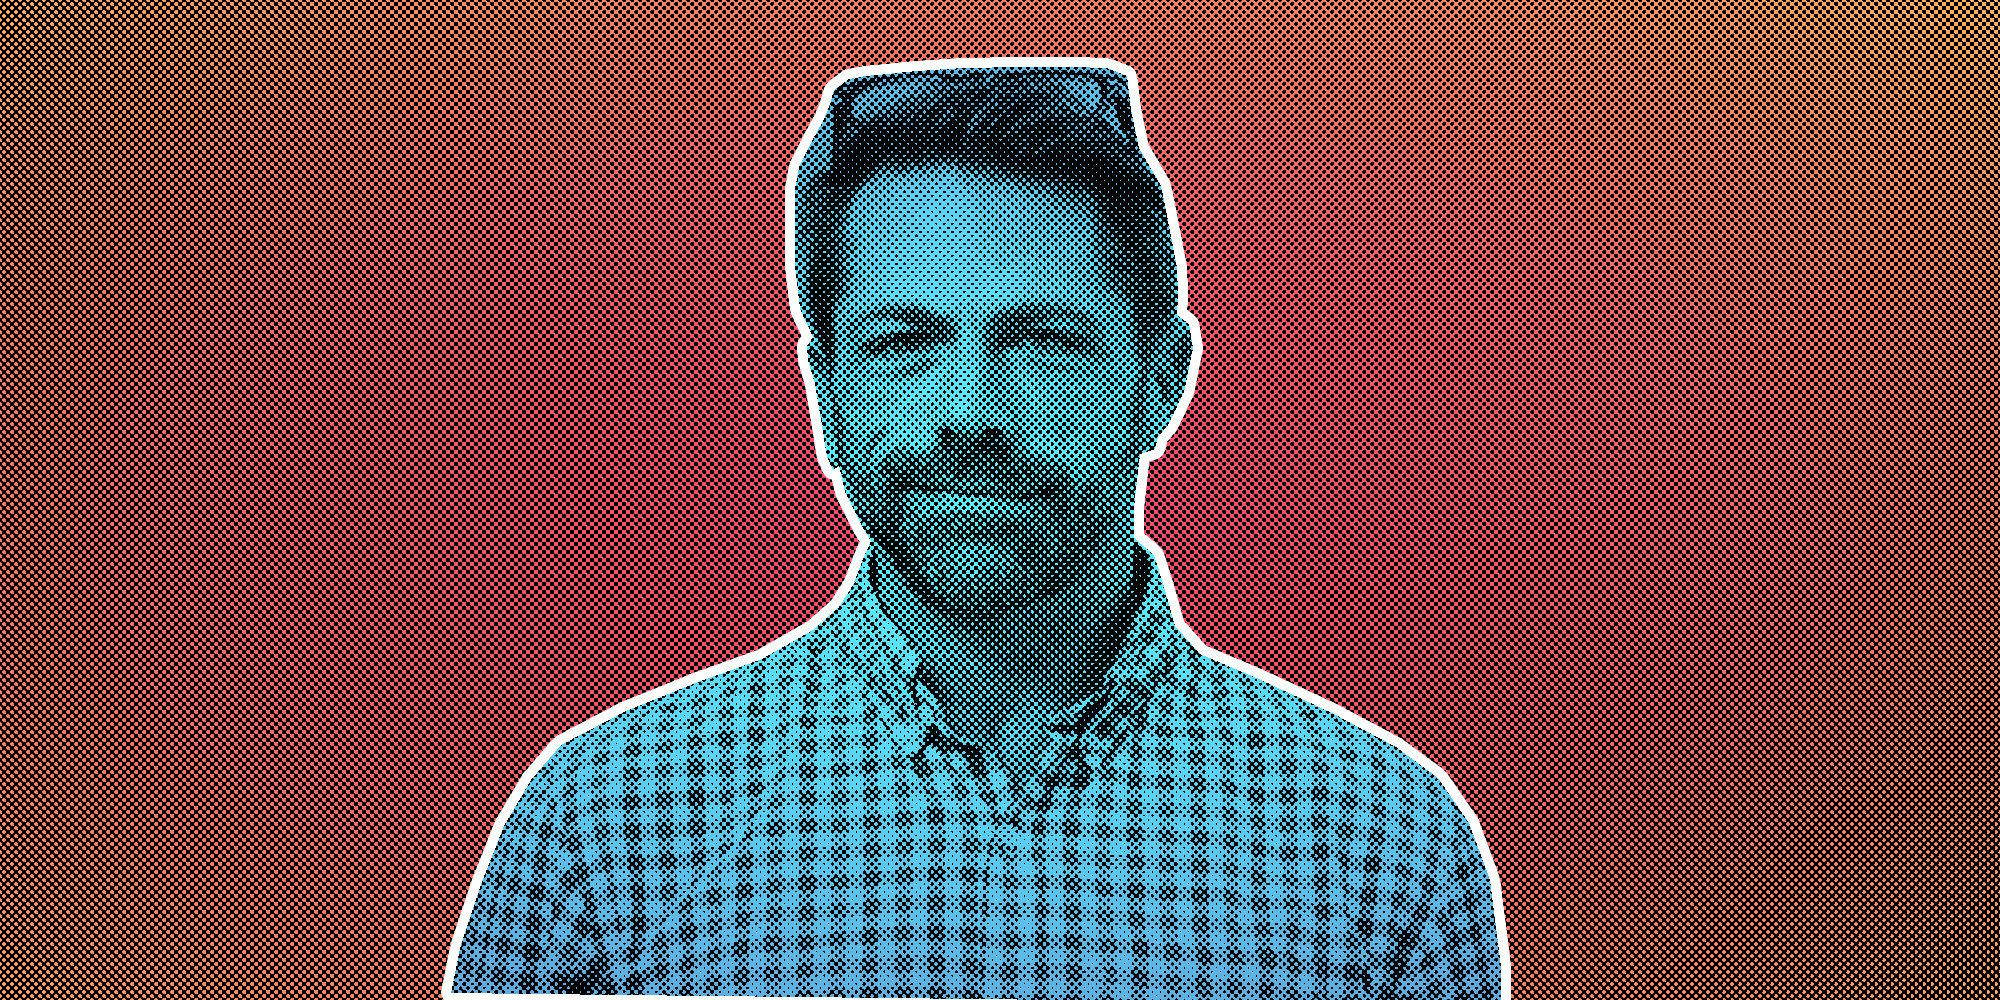 Long-term HIV survivor Sean McKenna today.